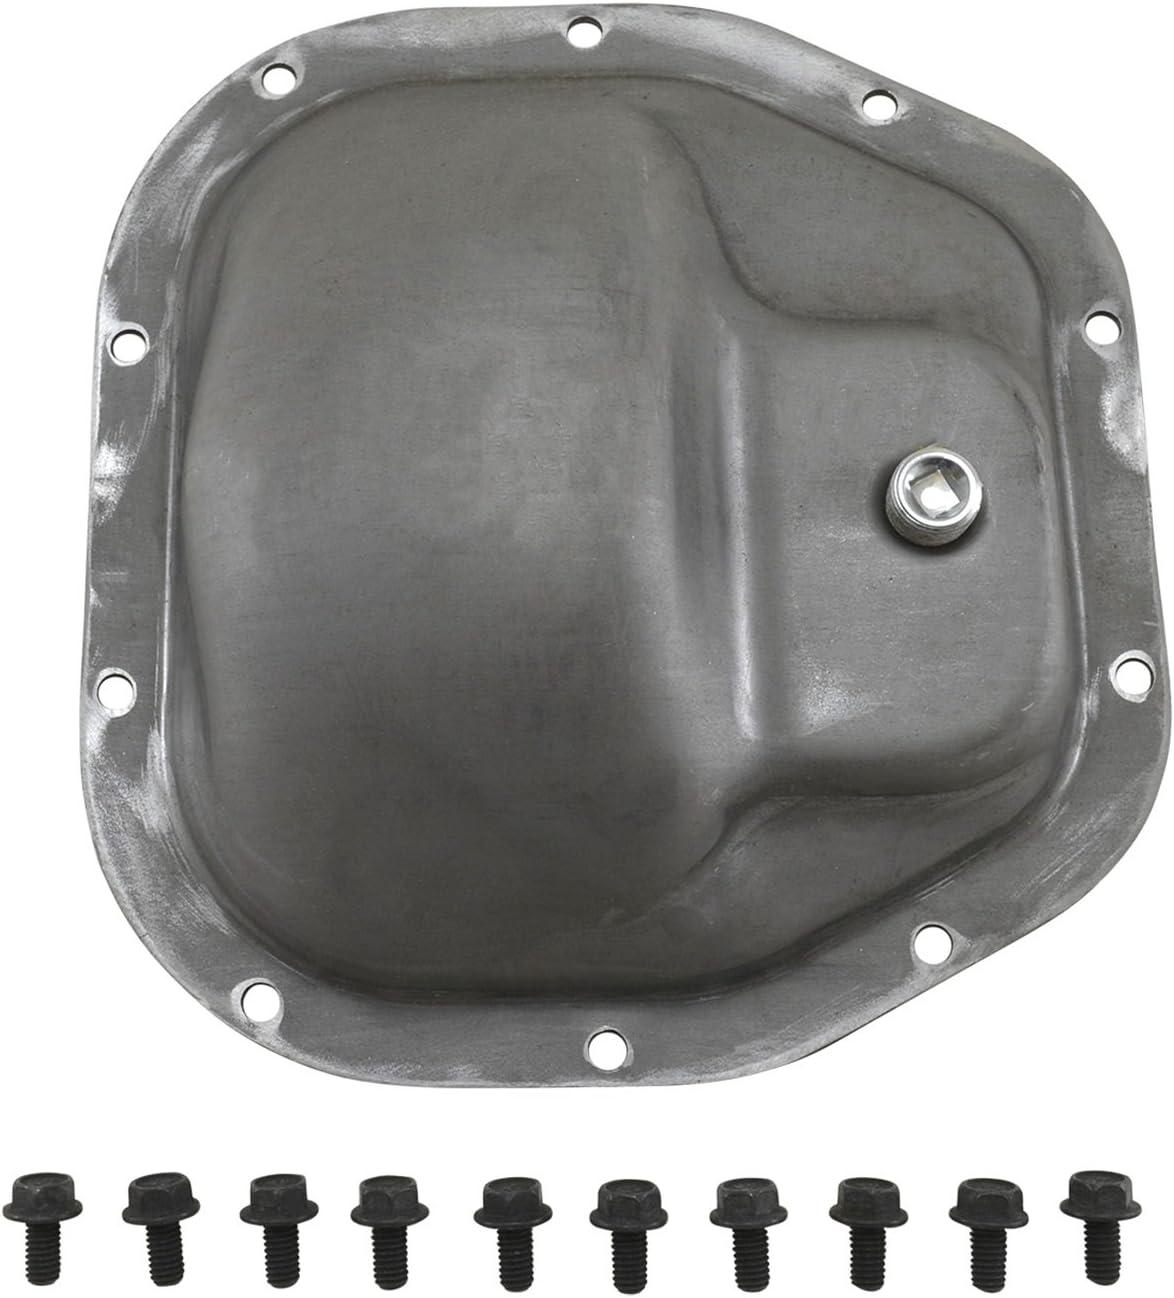 Yukon Gear Long Beach Mall Axle YP C5-D44HD Steel Dana for Ranking TOP2 Differ 44HD Cover